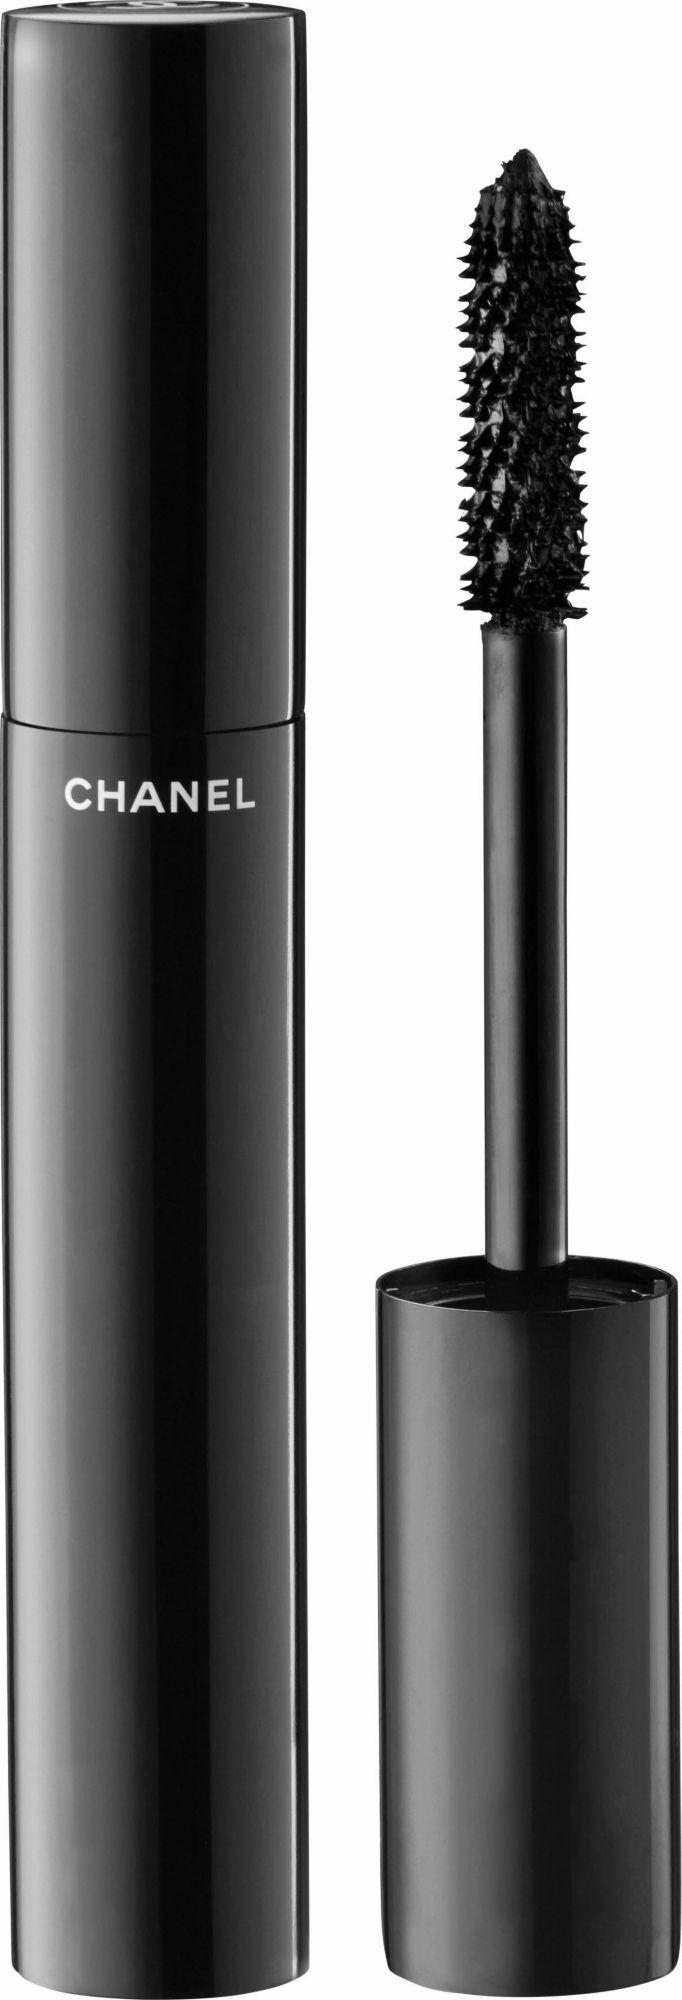 CHANEL Chanel, »Le Volume de Chanel Waterproof«, Mascara